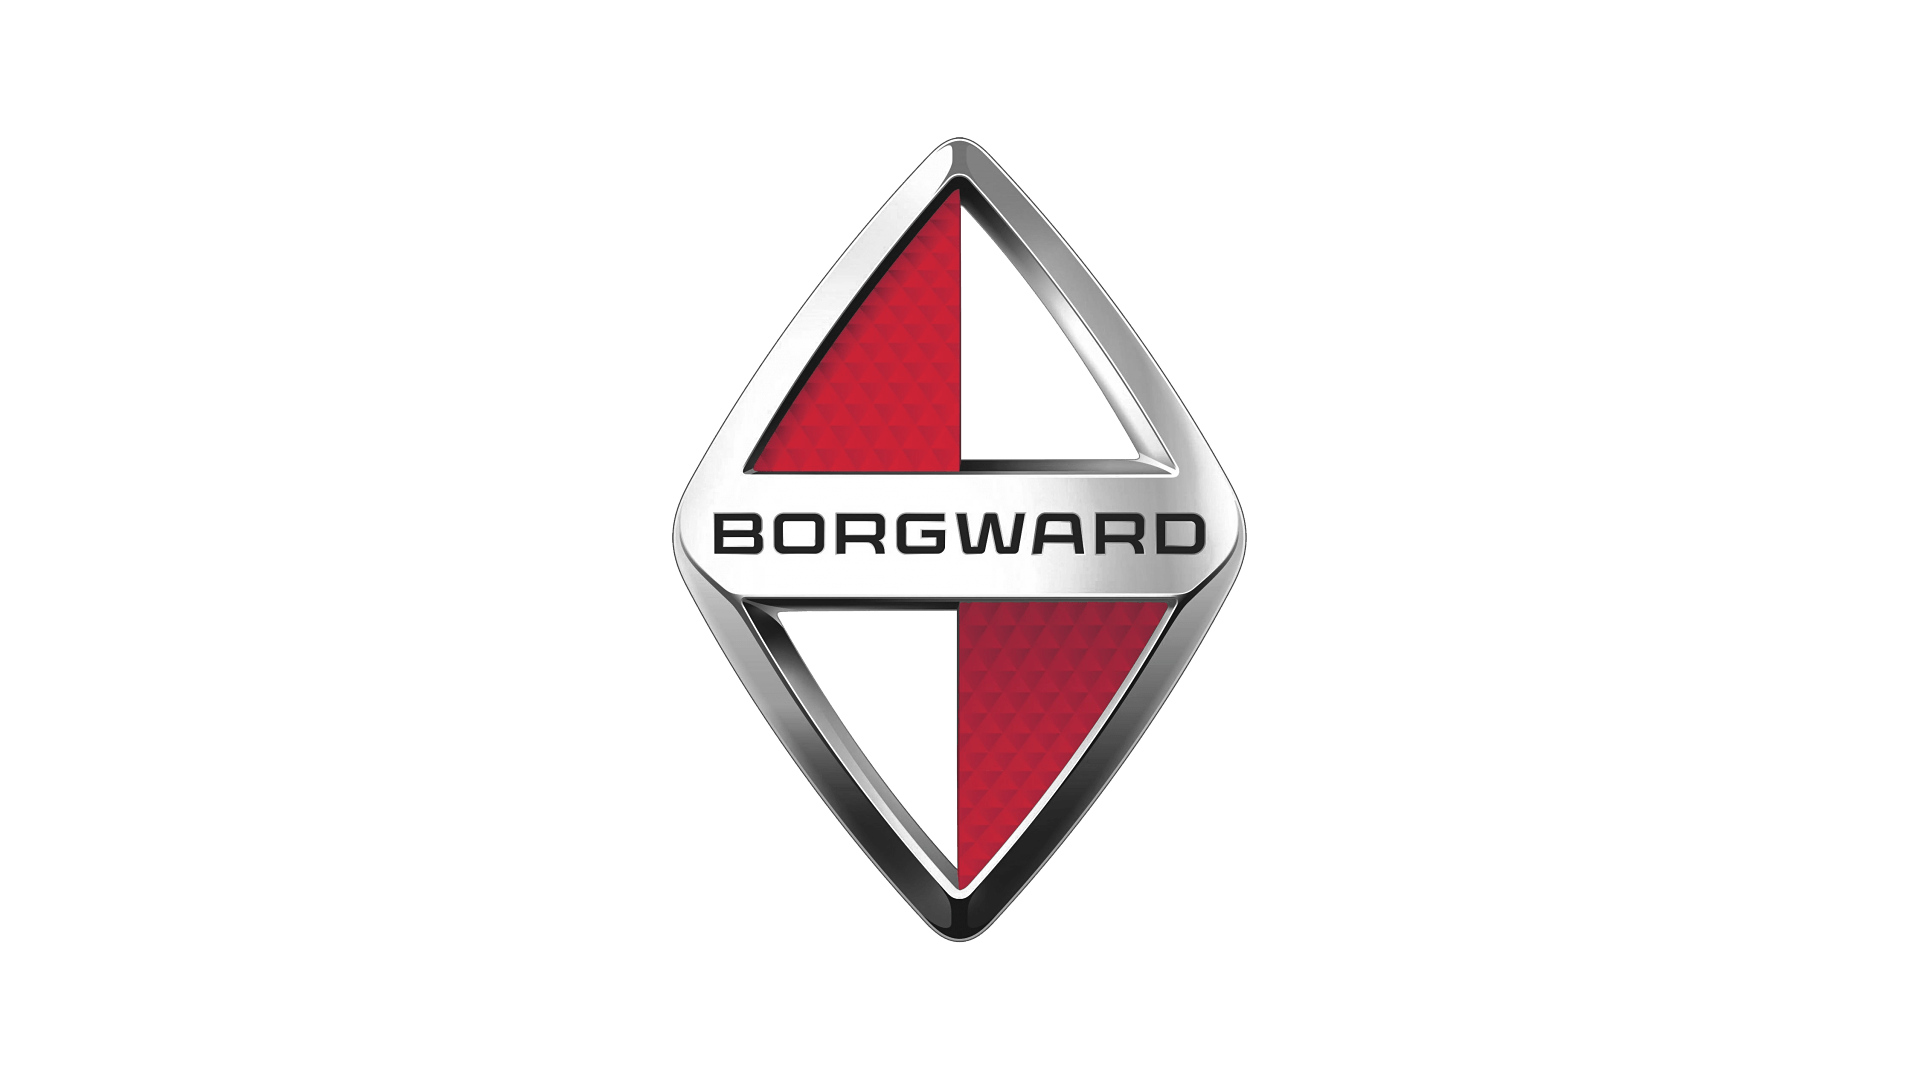 Car Logo Borgward - Car, Transparent background PNG HD thumbnail